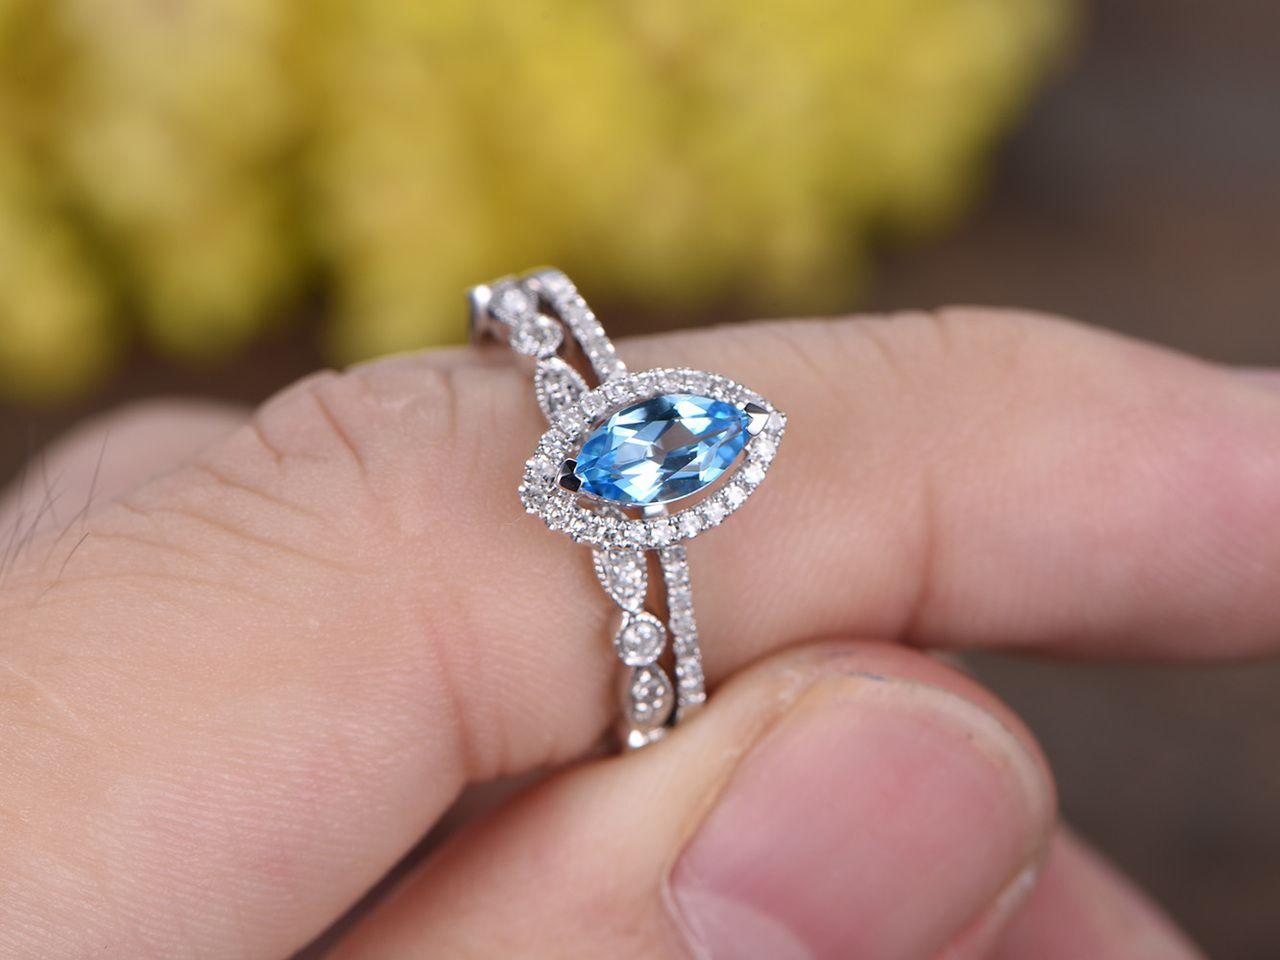 13 carat marquise blue topaz wedding ring set 14k white